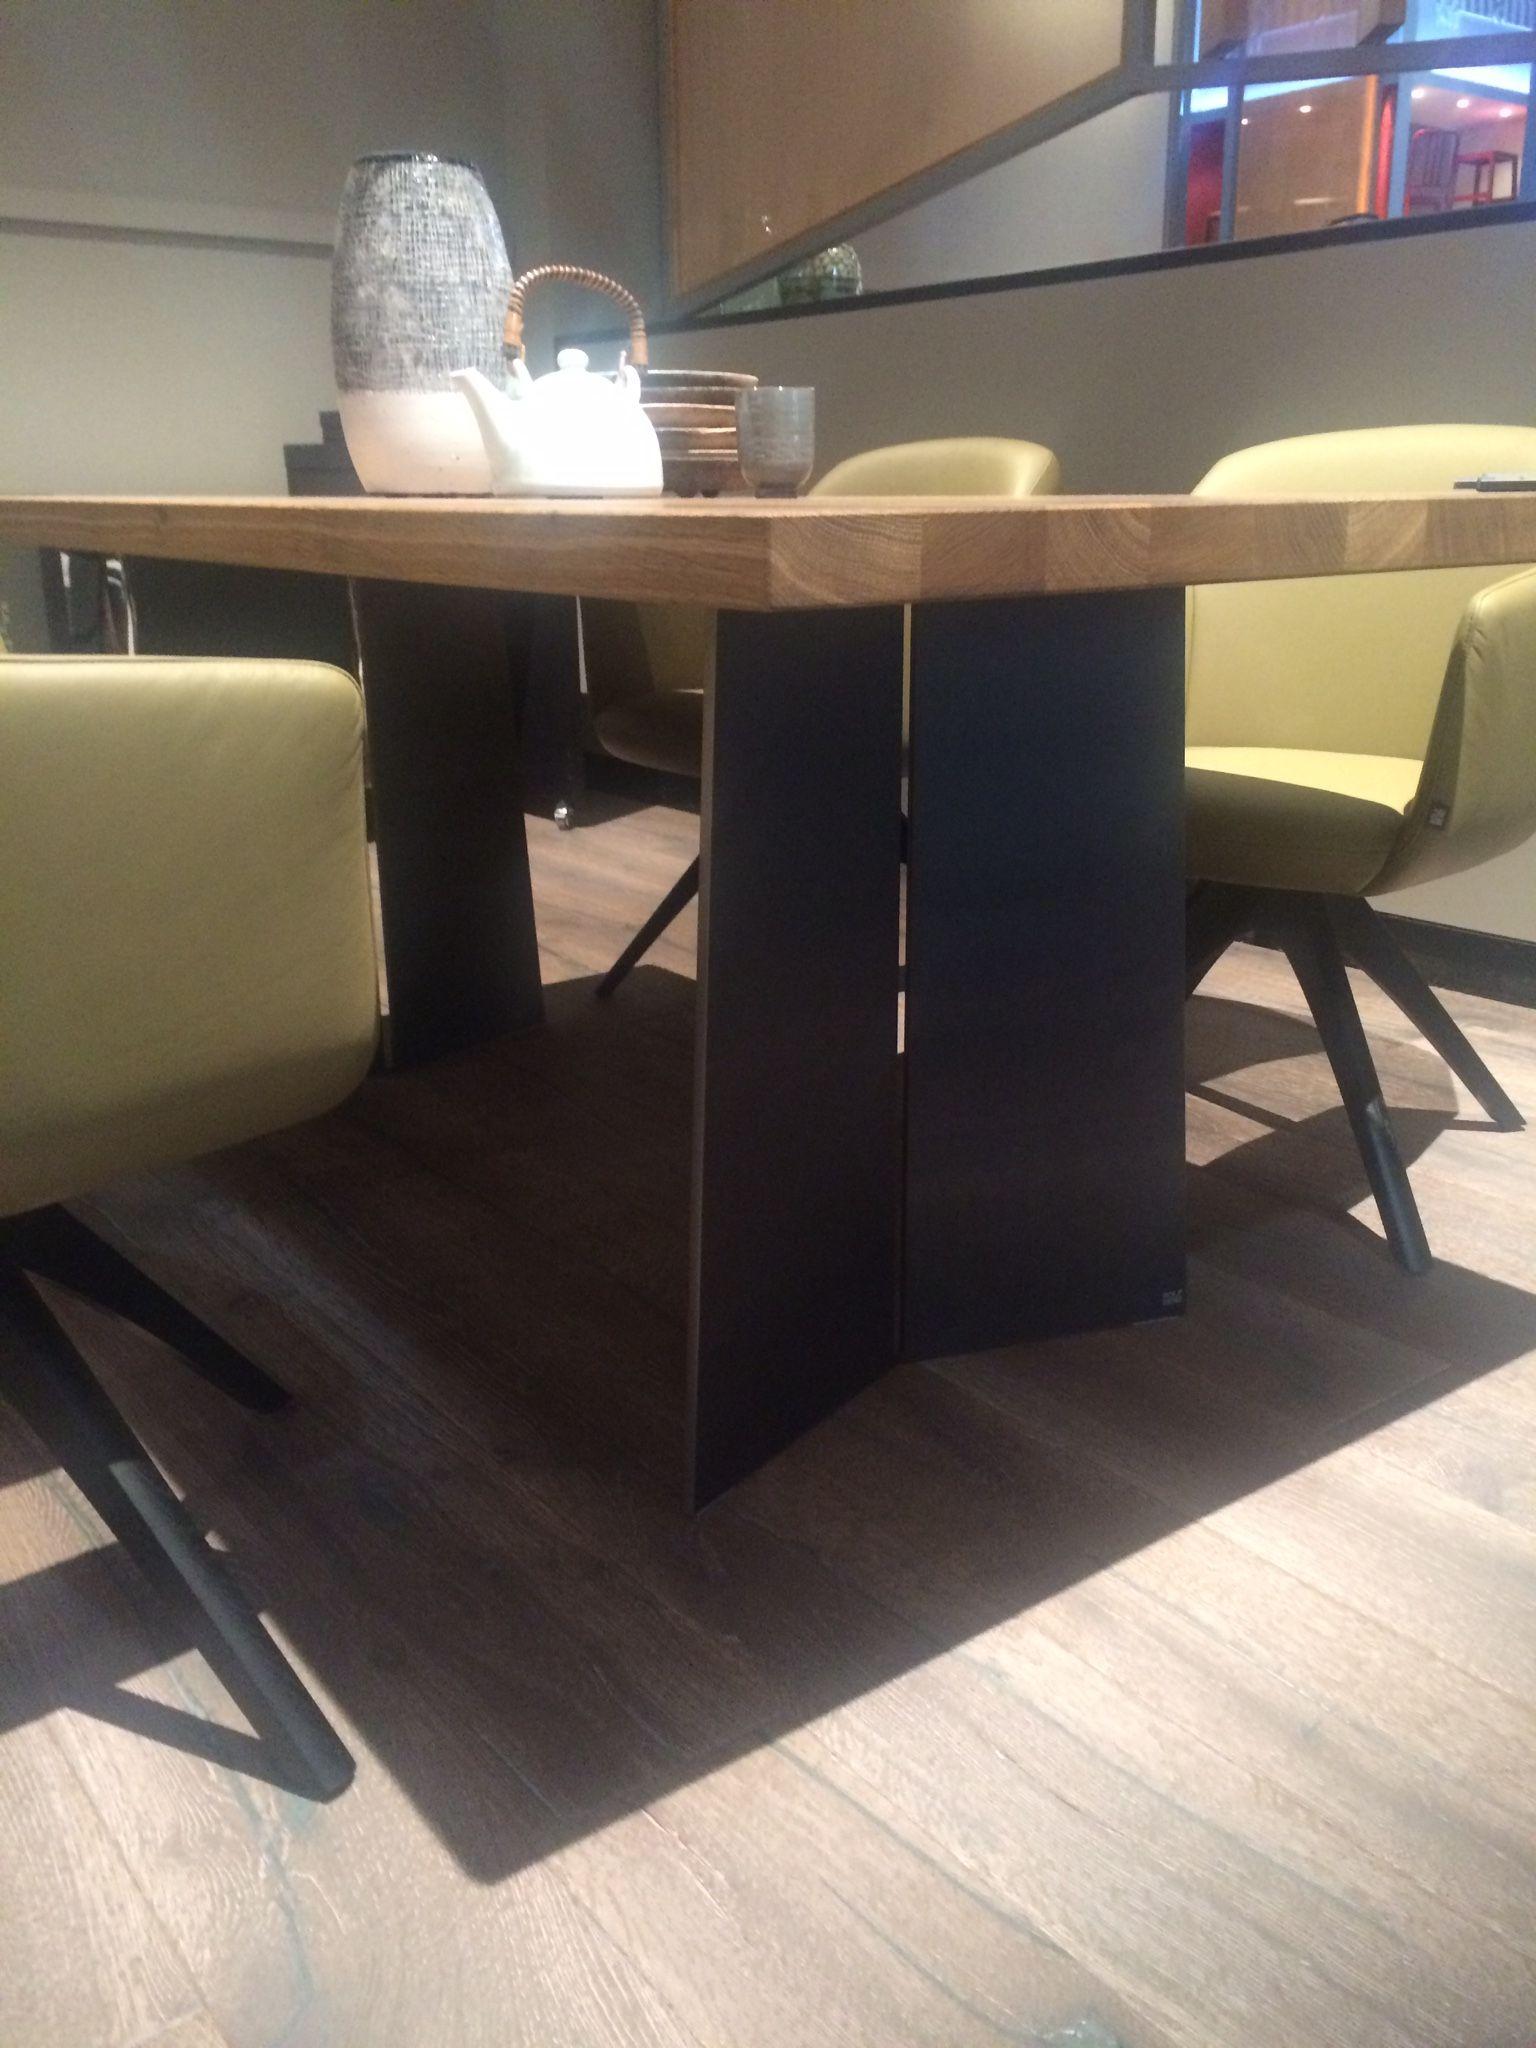 Rolf Benz Dining Table 969 By Silja Beck Rolfbenz Modernliving Contemporary Designtable Moderndining Www Rolf Benz Com Rolfbenz